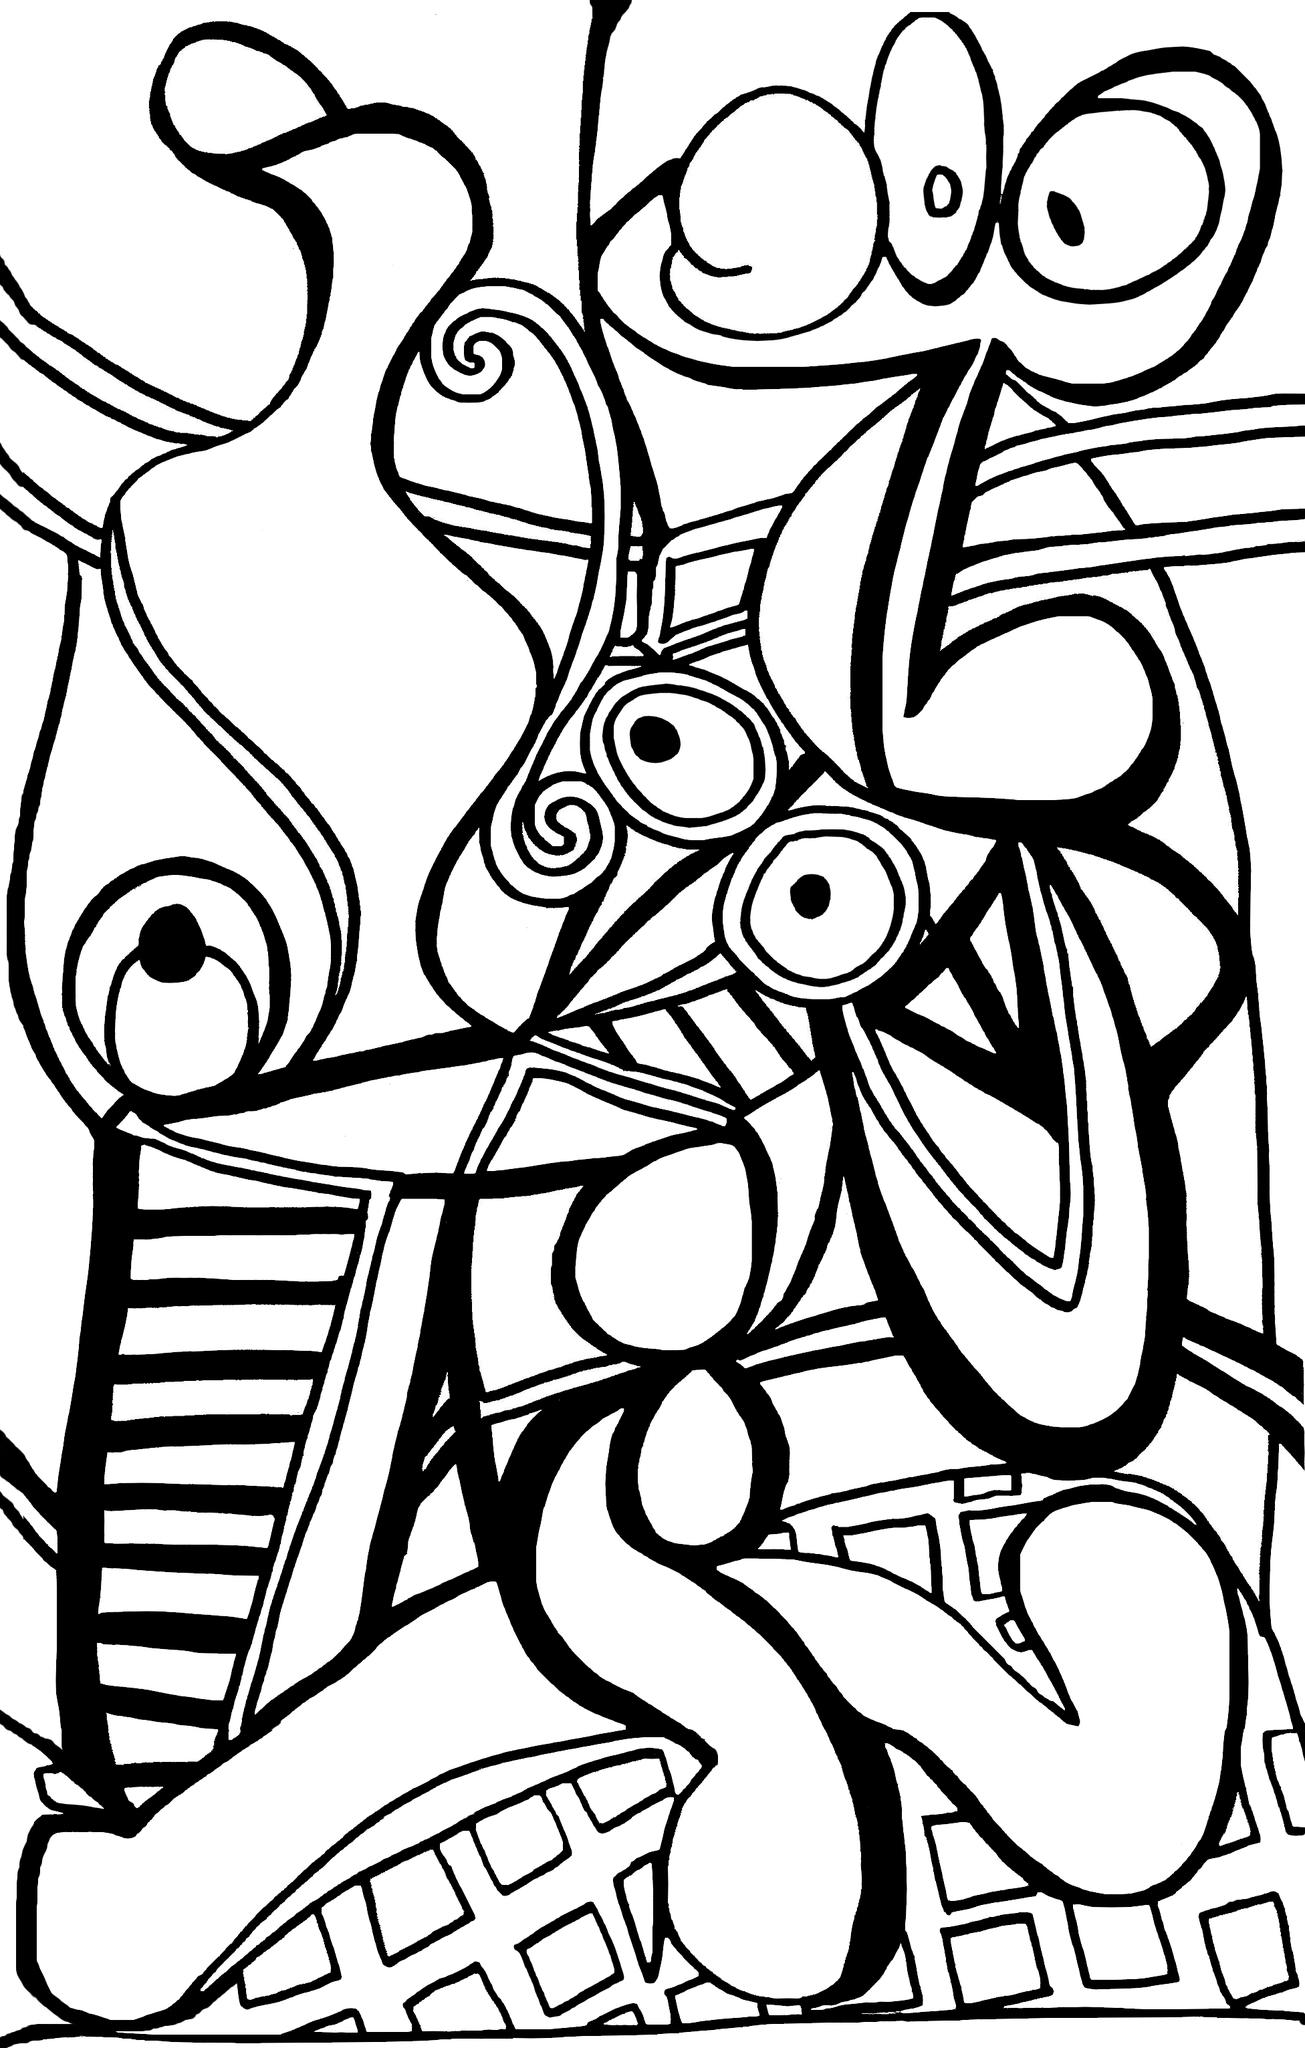 Le Picasso Casse